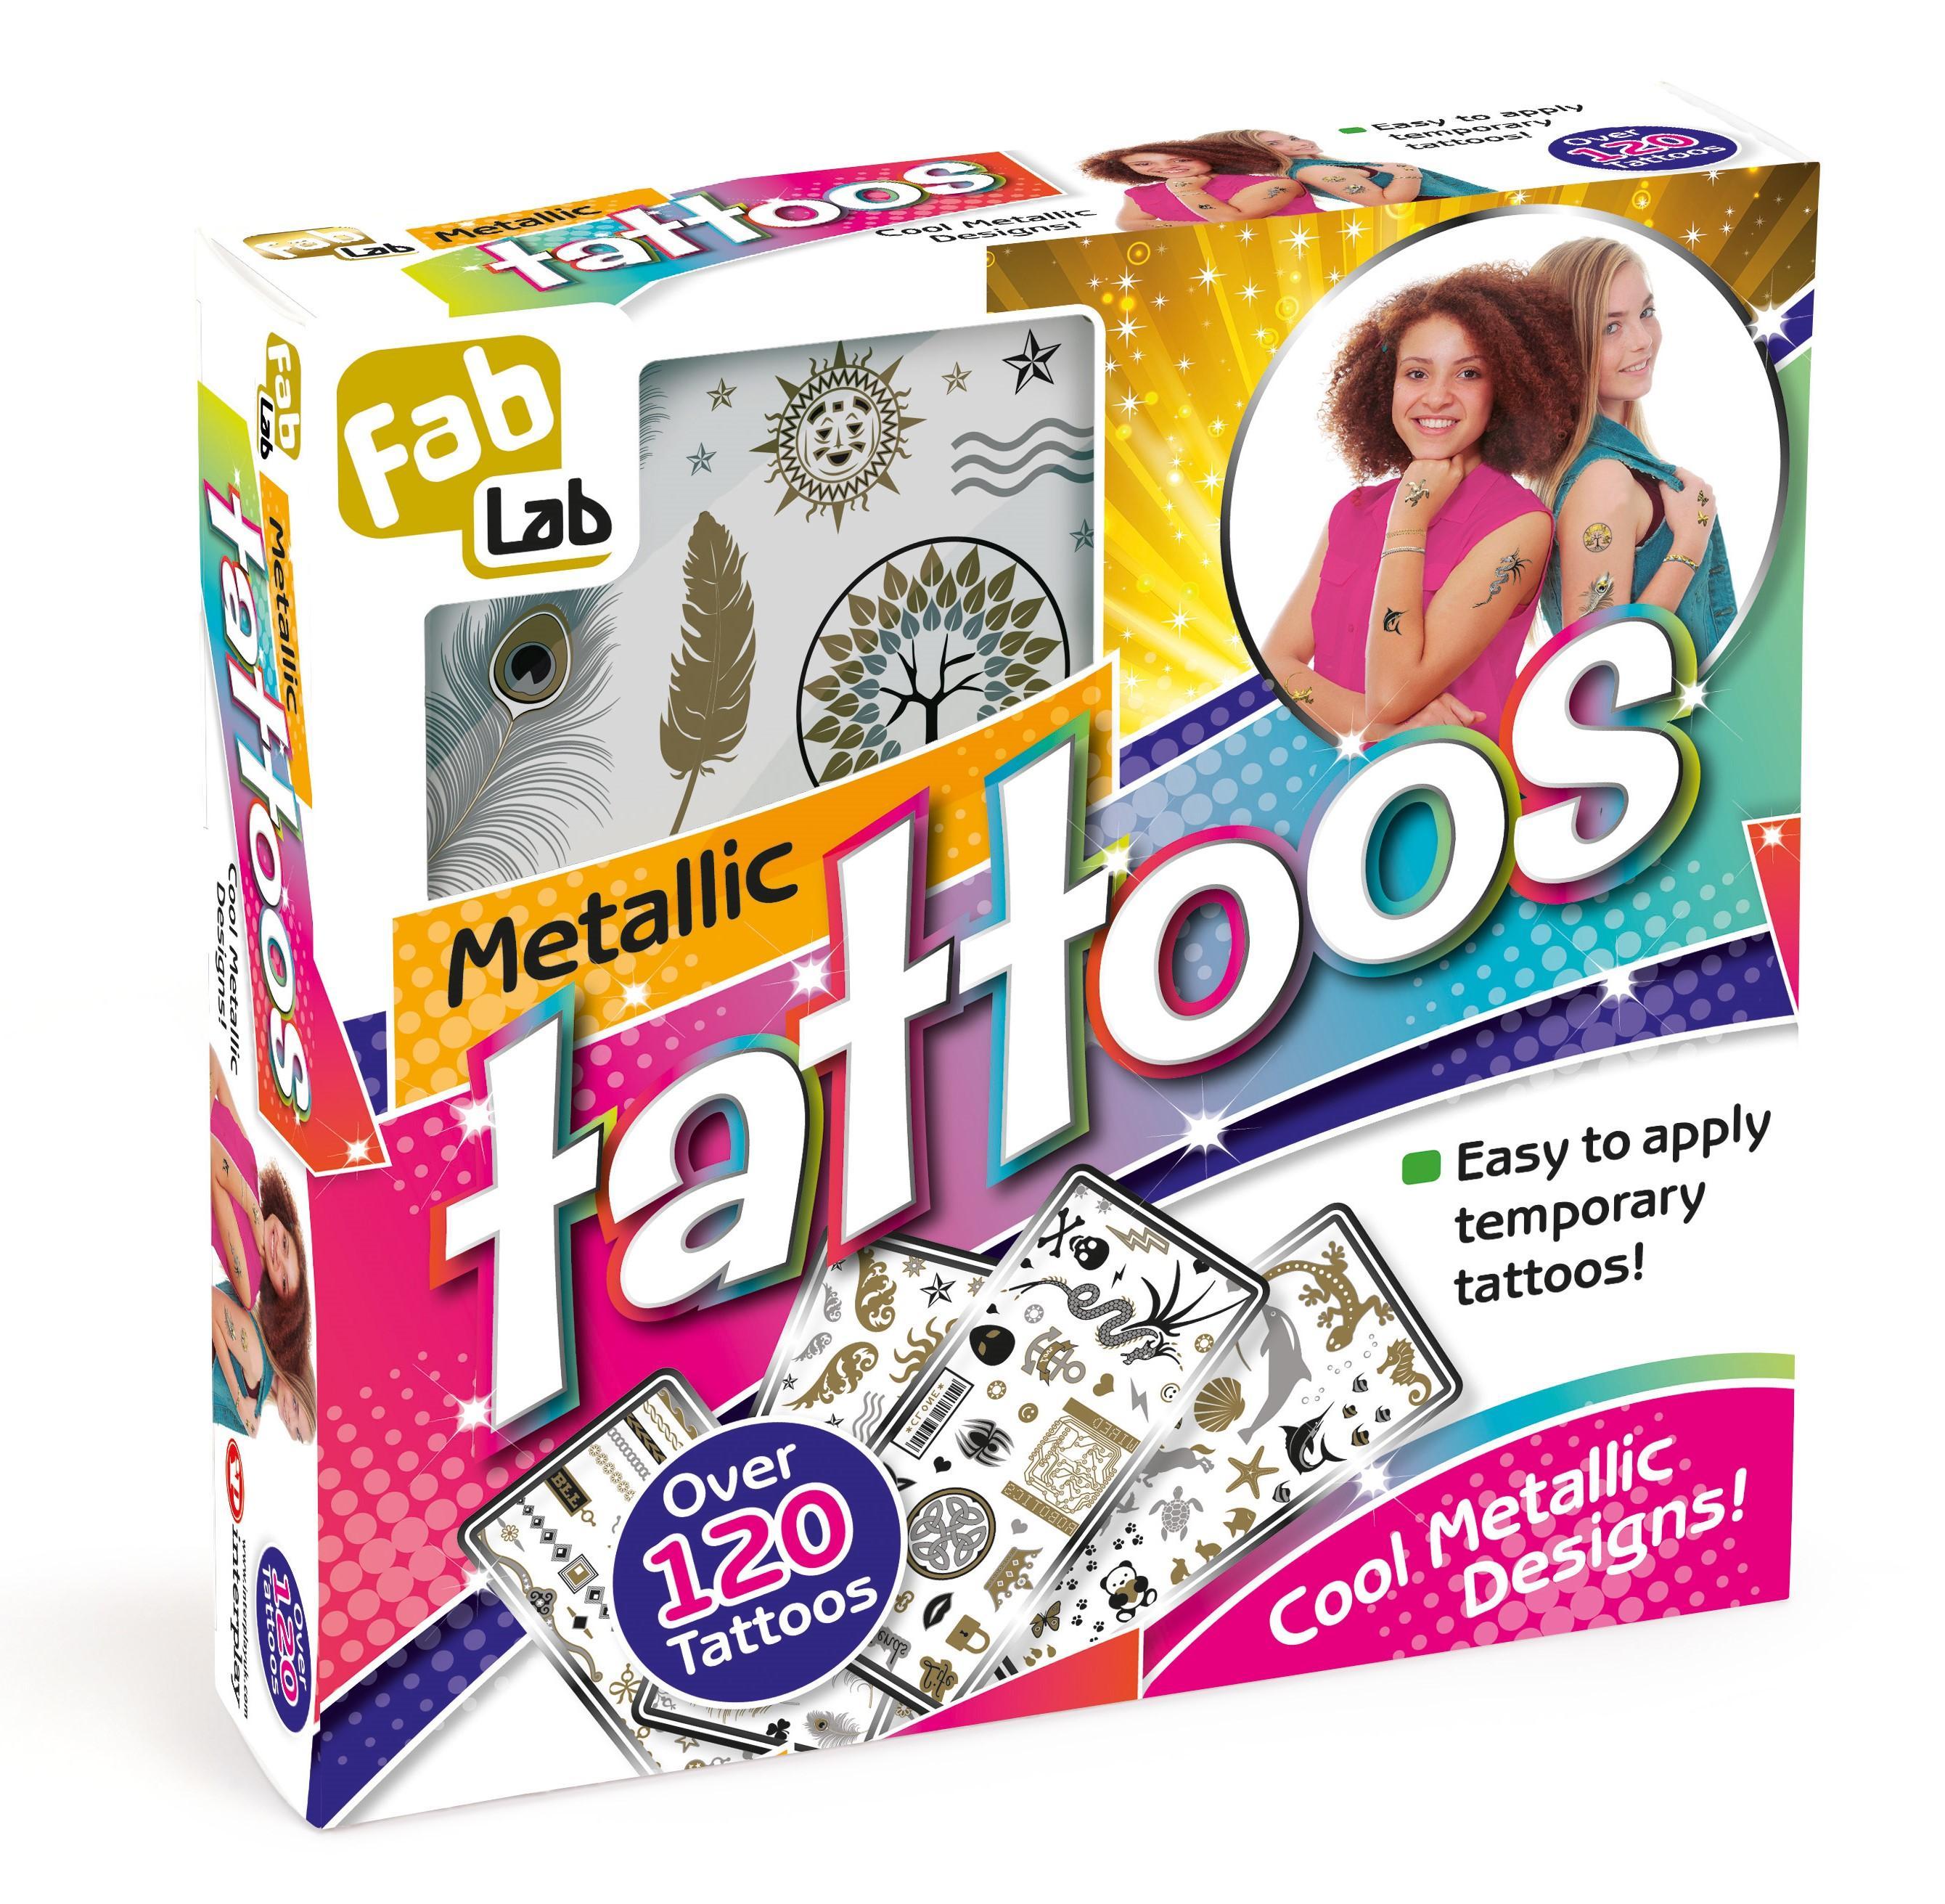 FabLab Nail Art Kit: Amazon.co.uk: Toys & Games